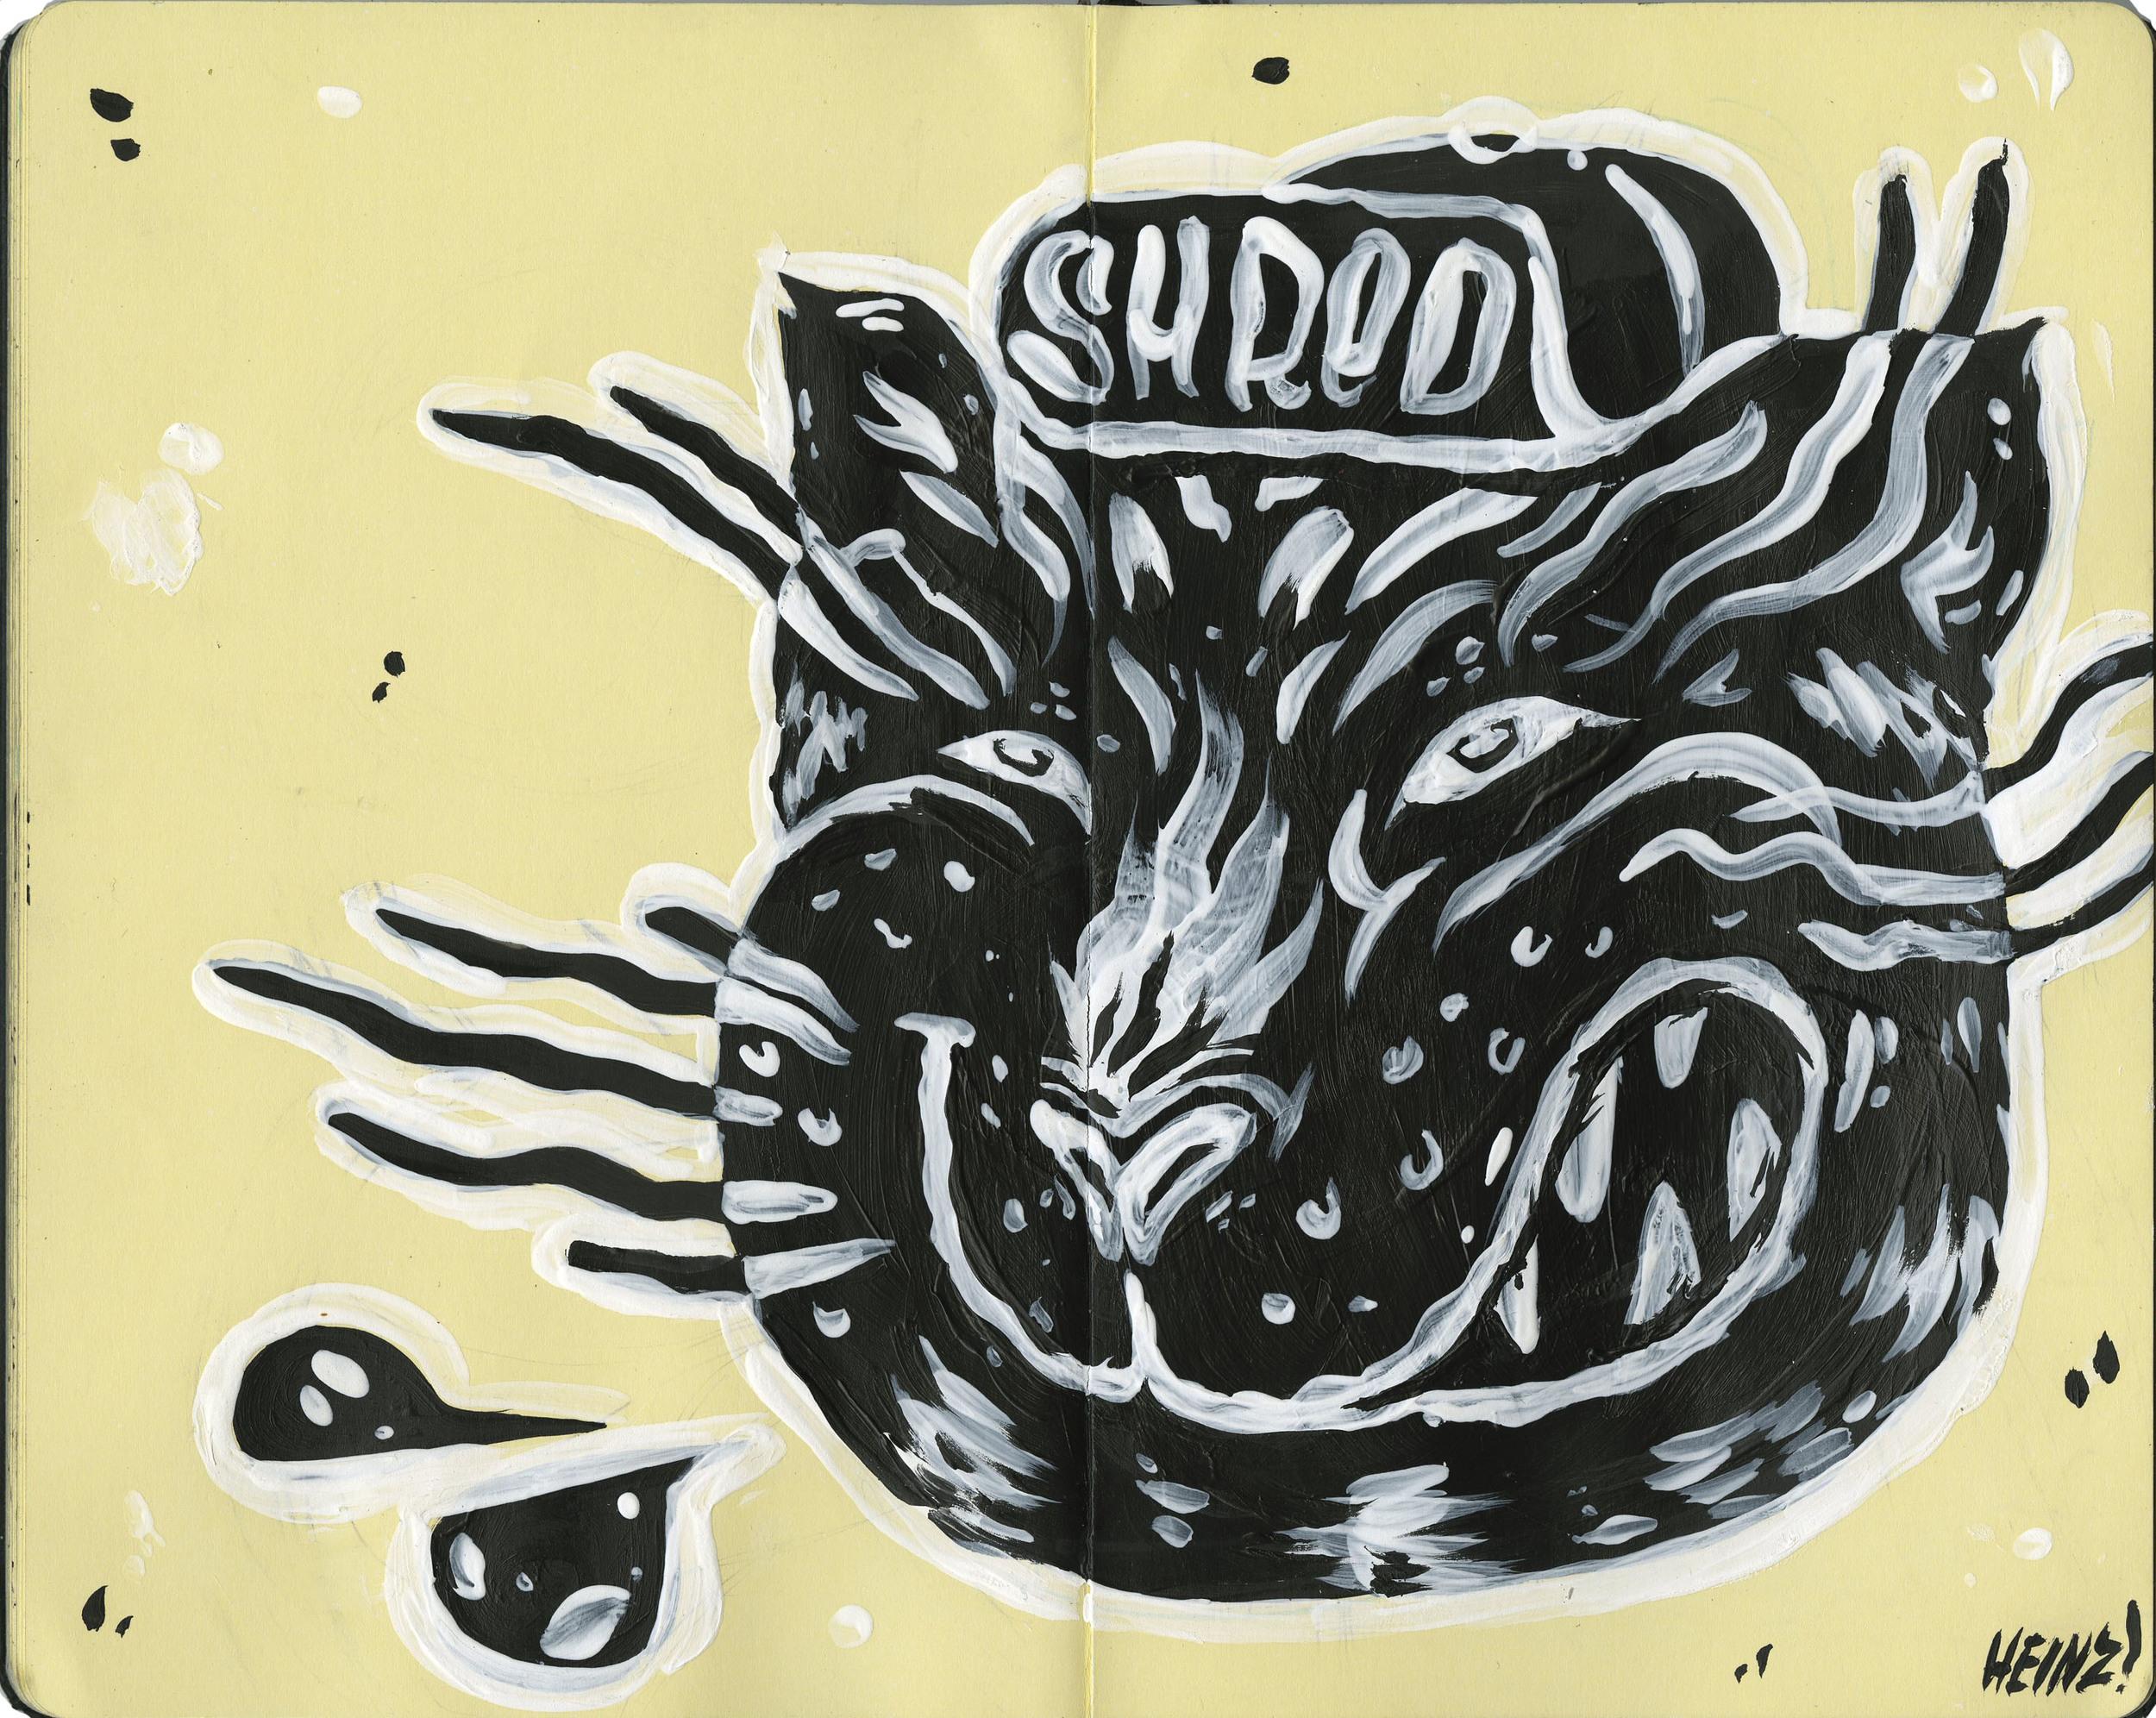 shredcat.jpg